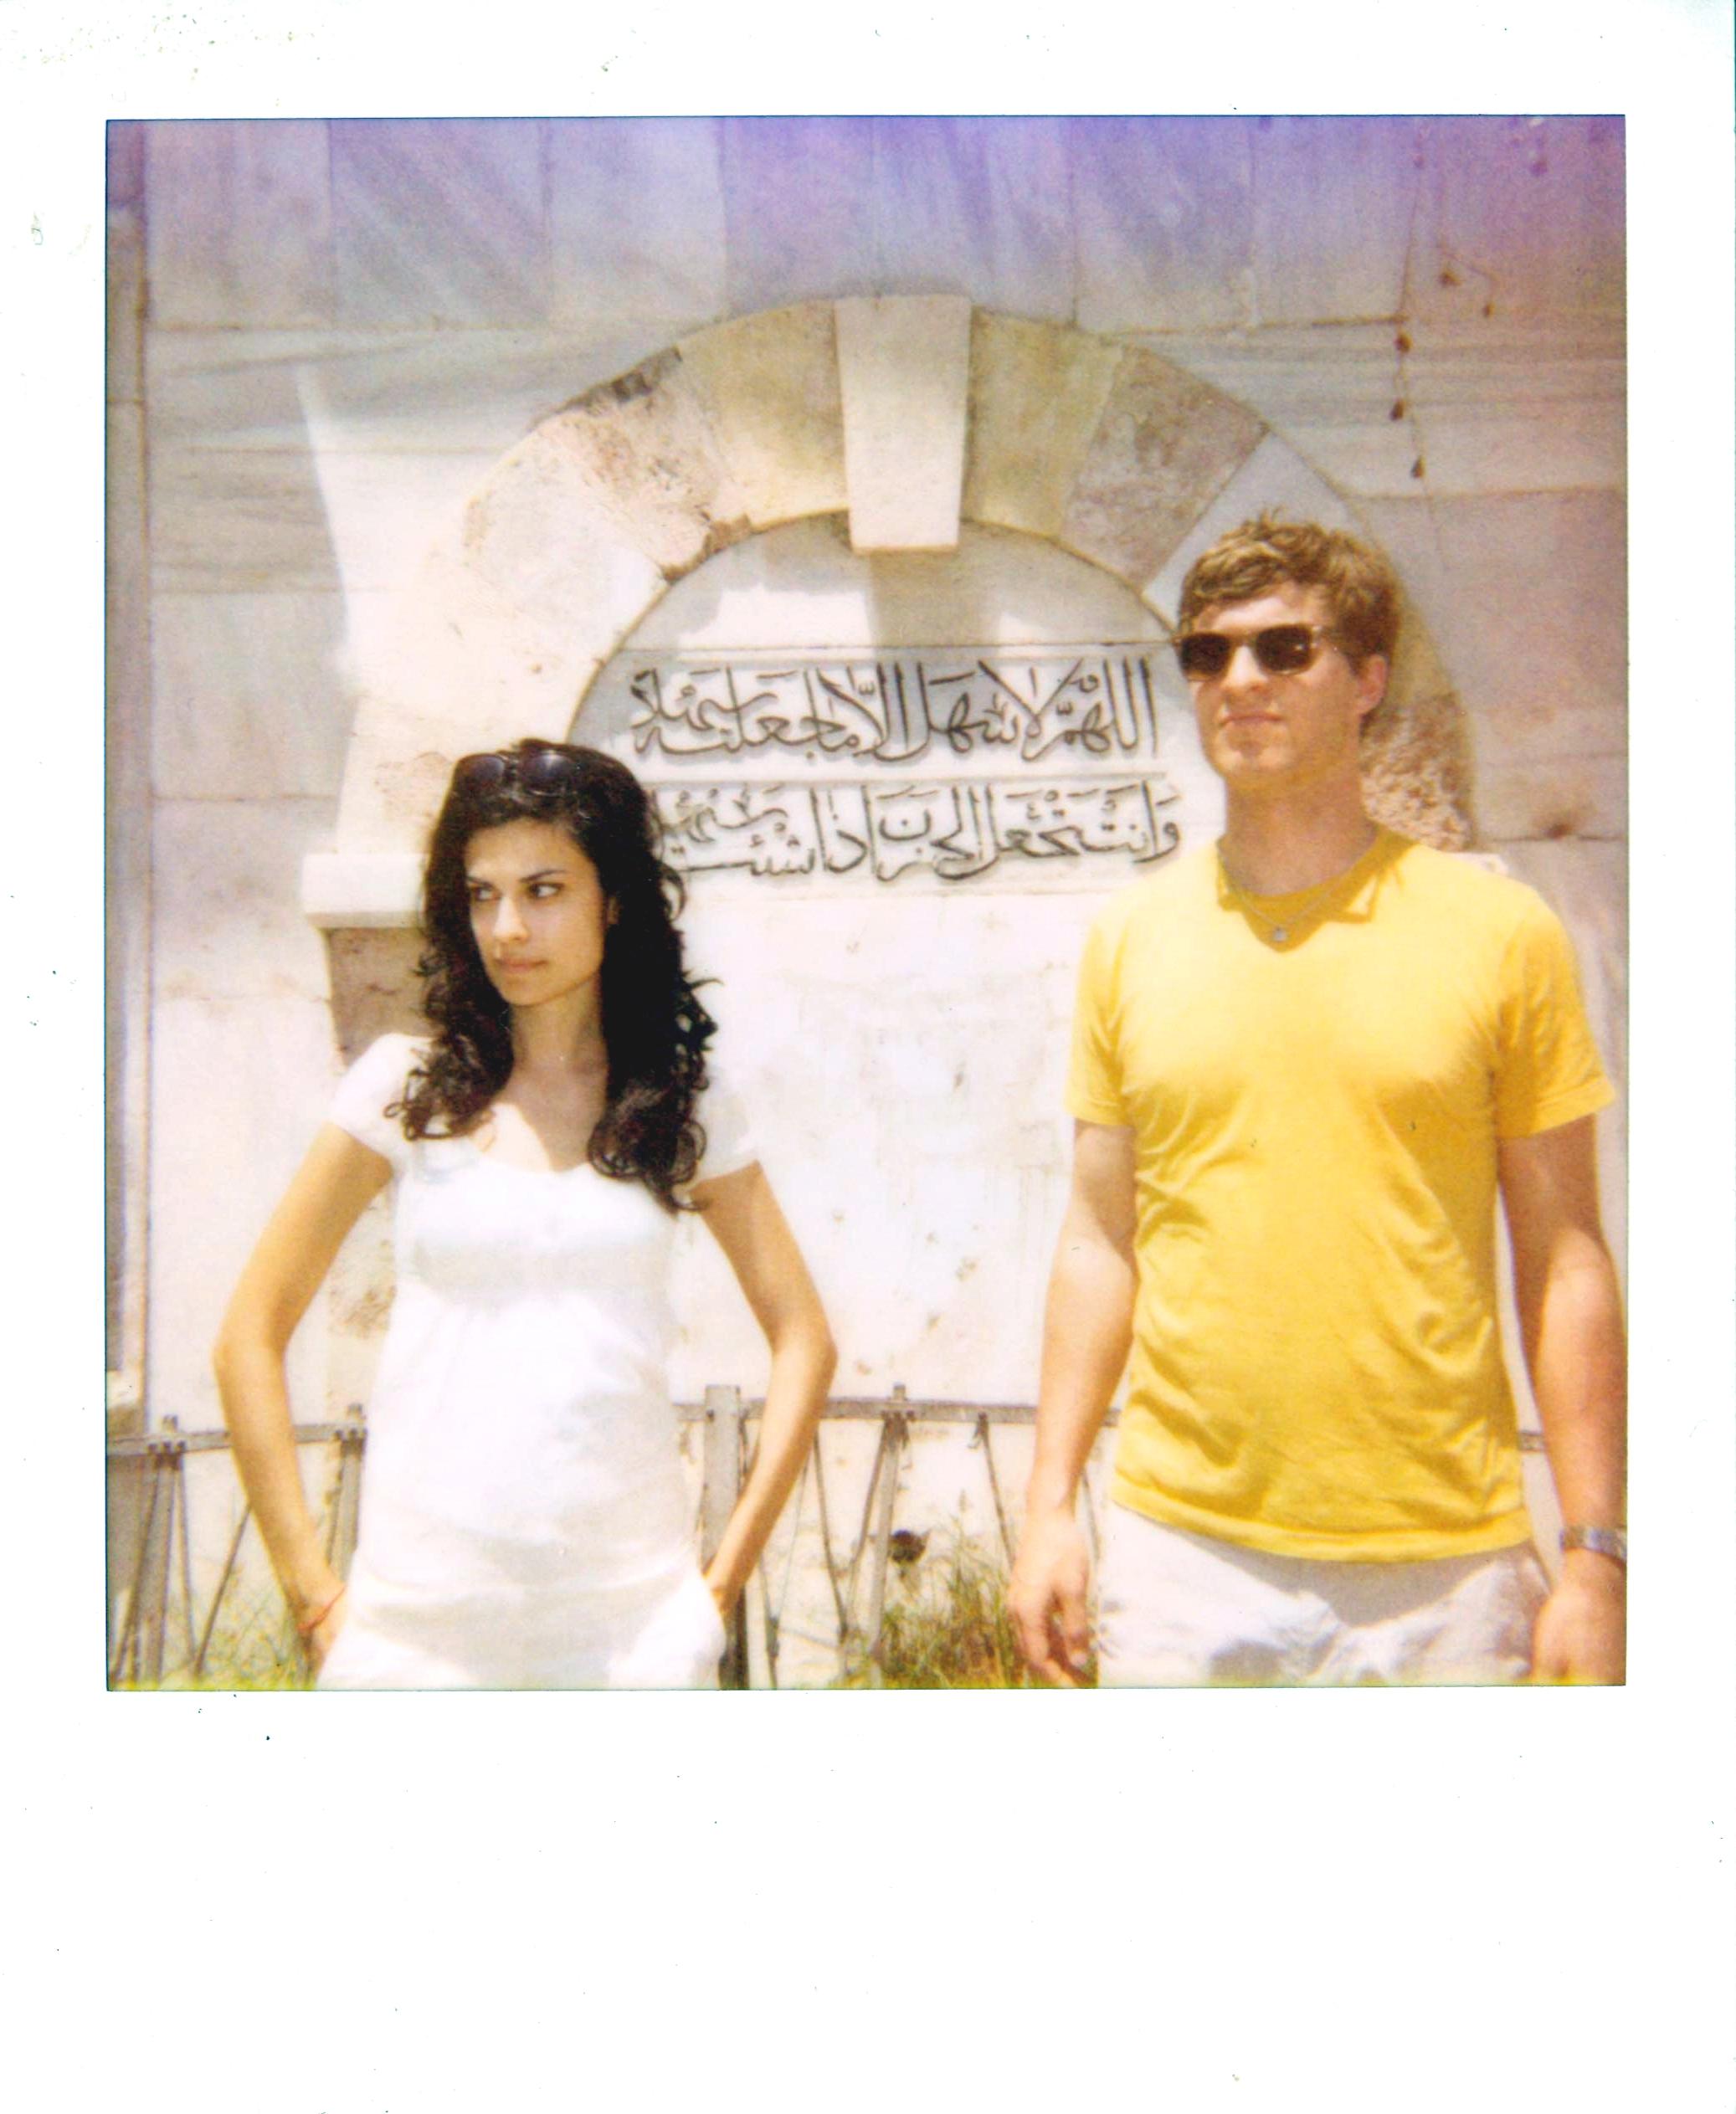 jaffa naim and shirin arabic acdc.jpg